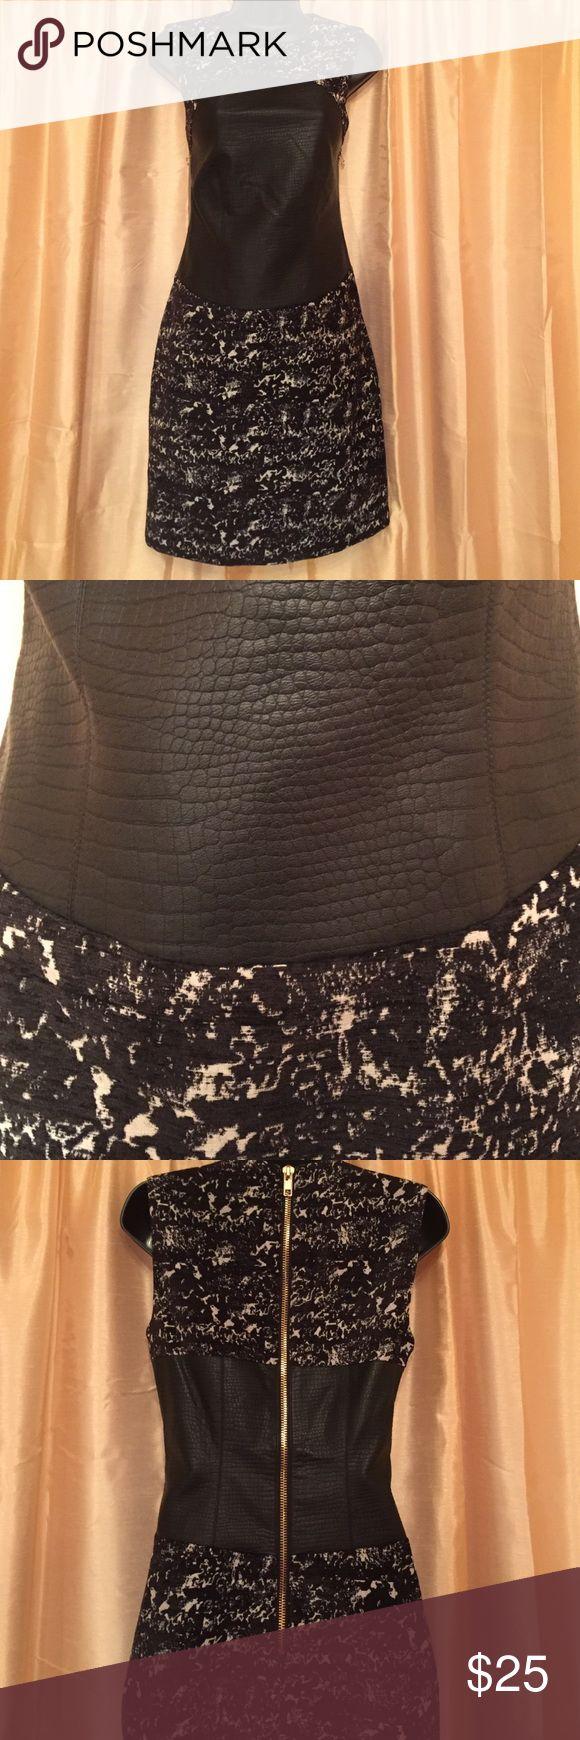 W118 by Walter baker size 8 dress! MSRP: $200 Brand new with tags w118 by water baker dress size small! W118 by Walter Baker Dresses Midi